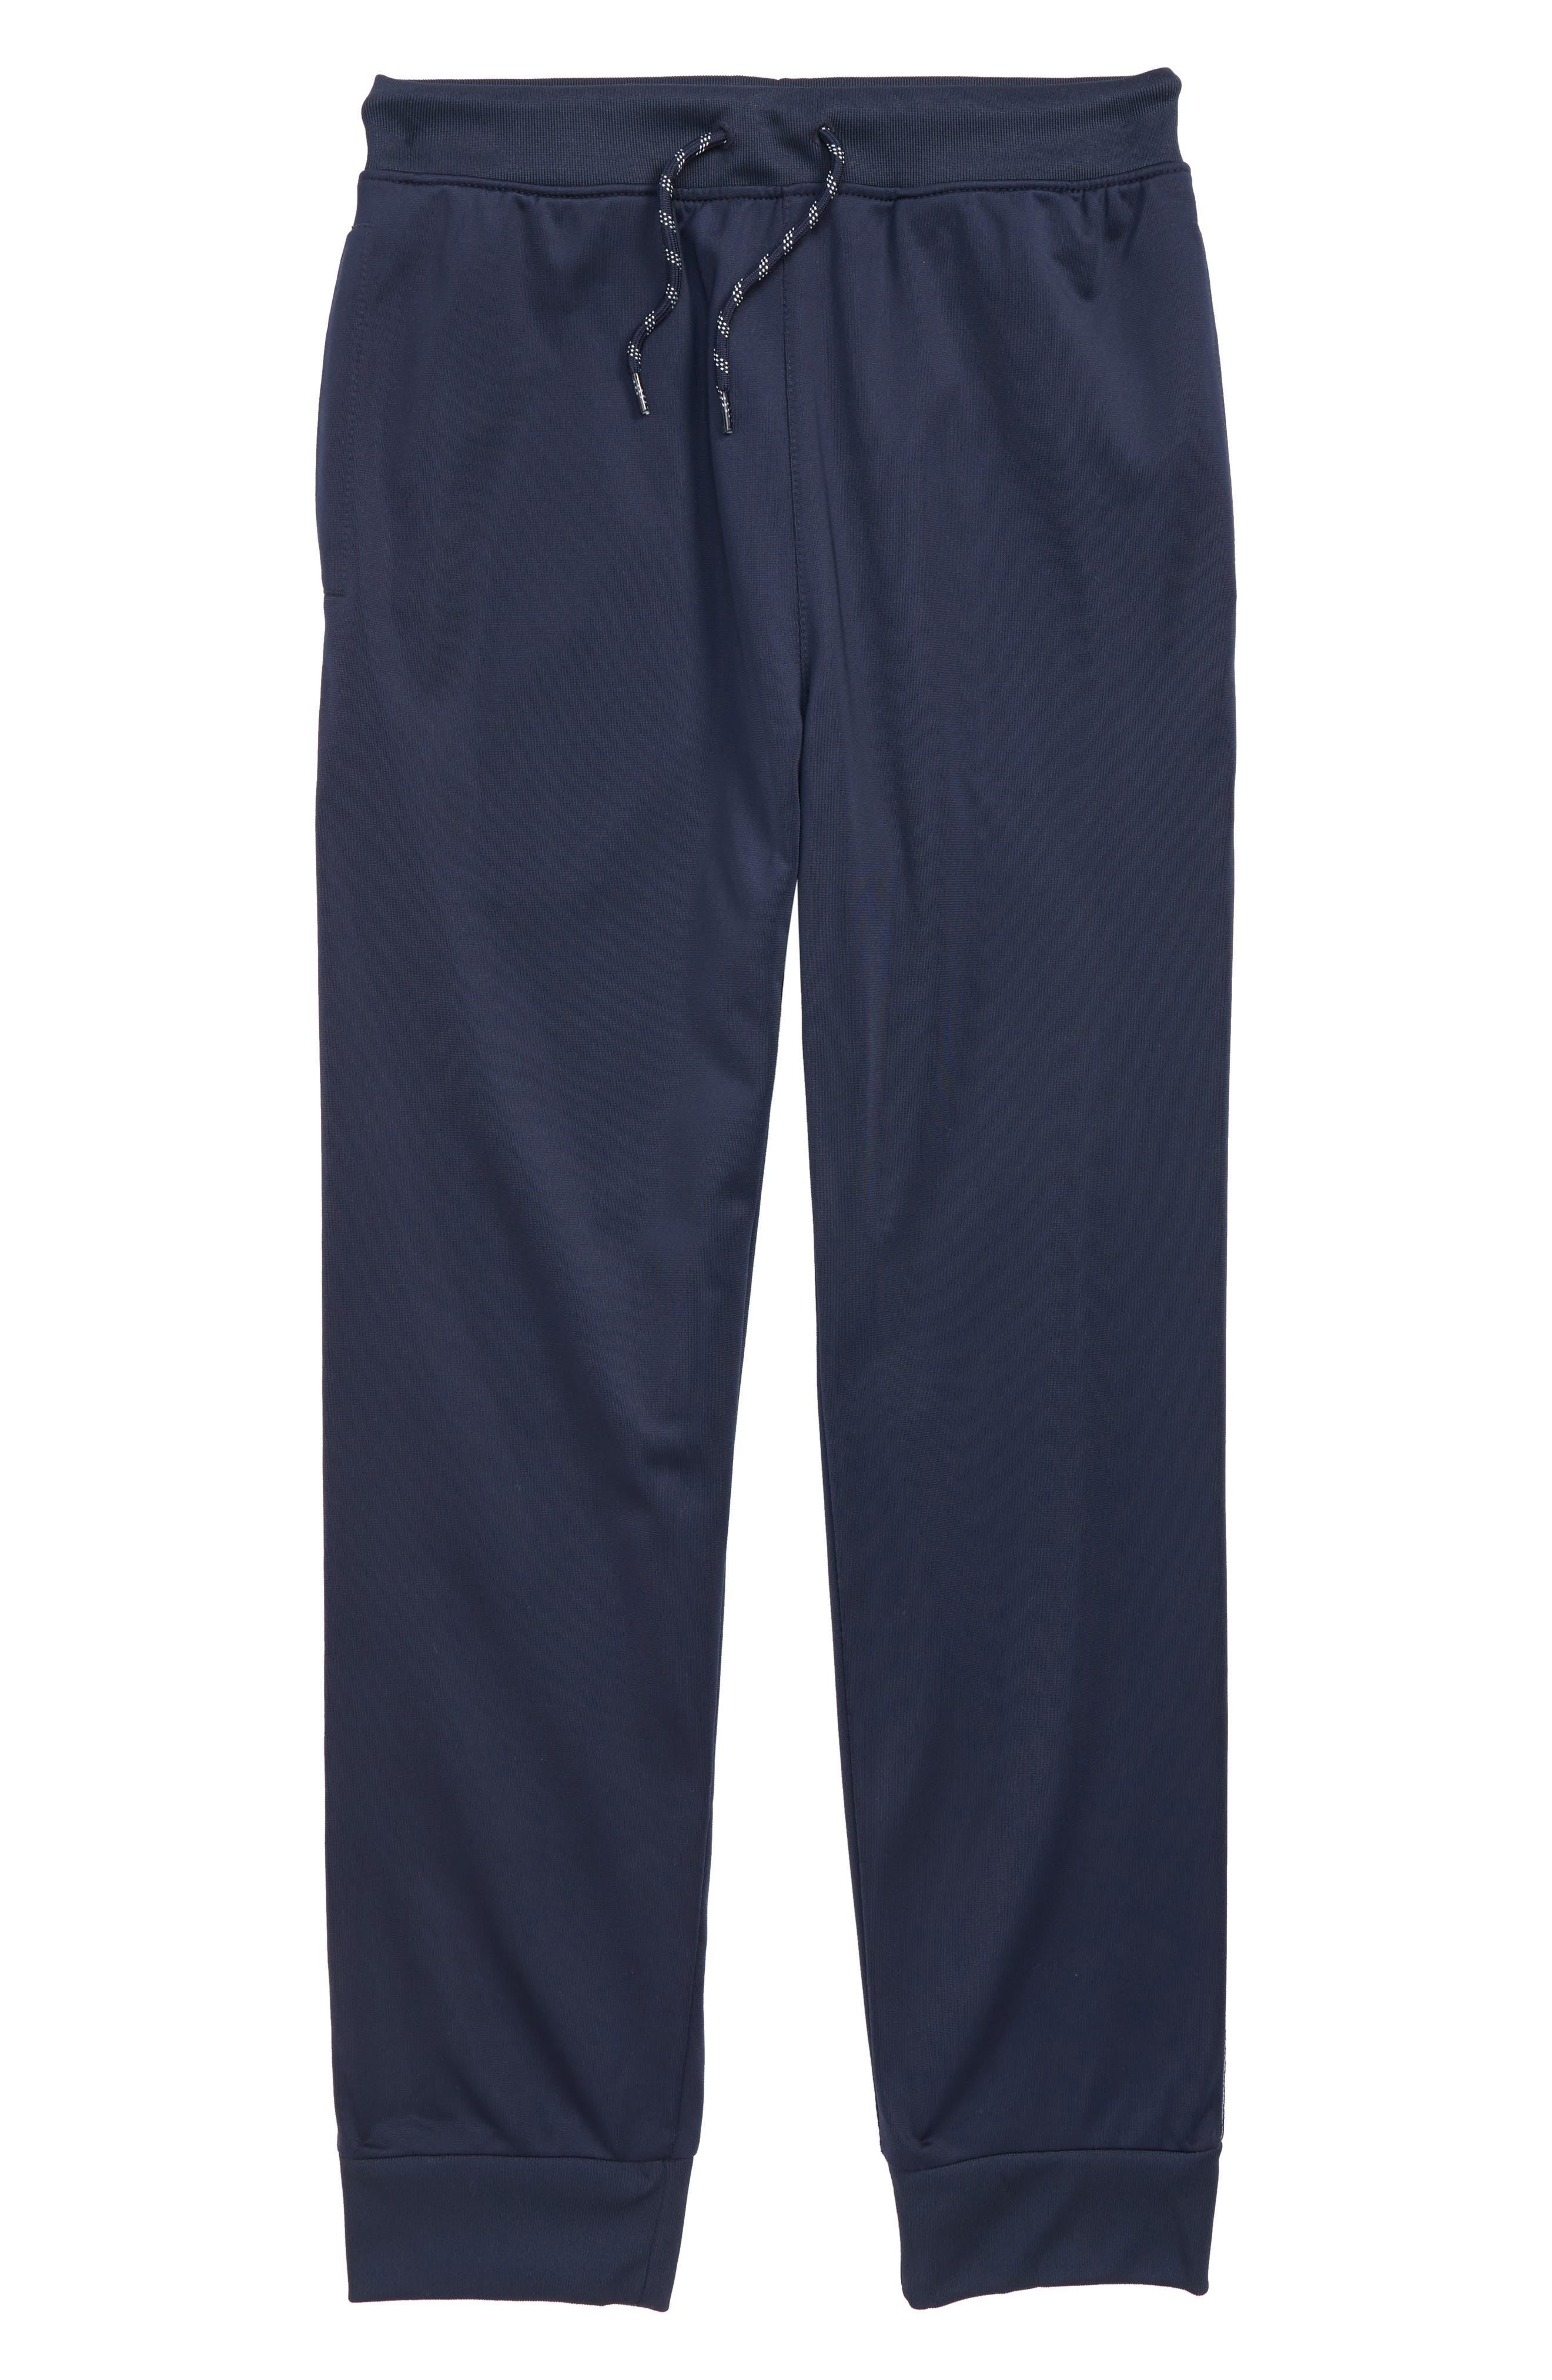 Track Pants,                         Main,                         color, 418